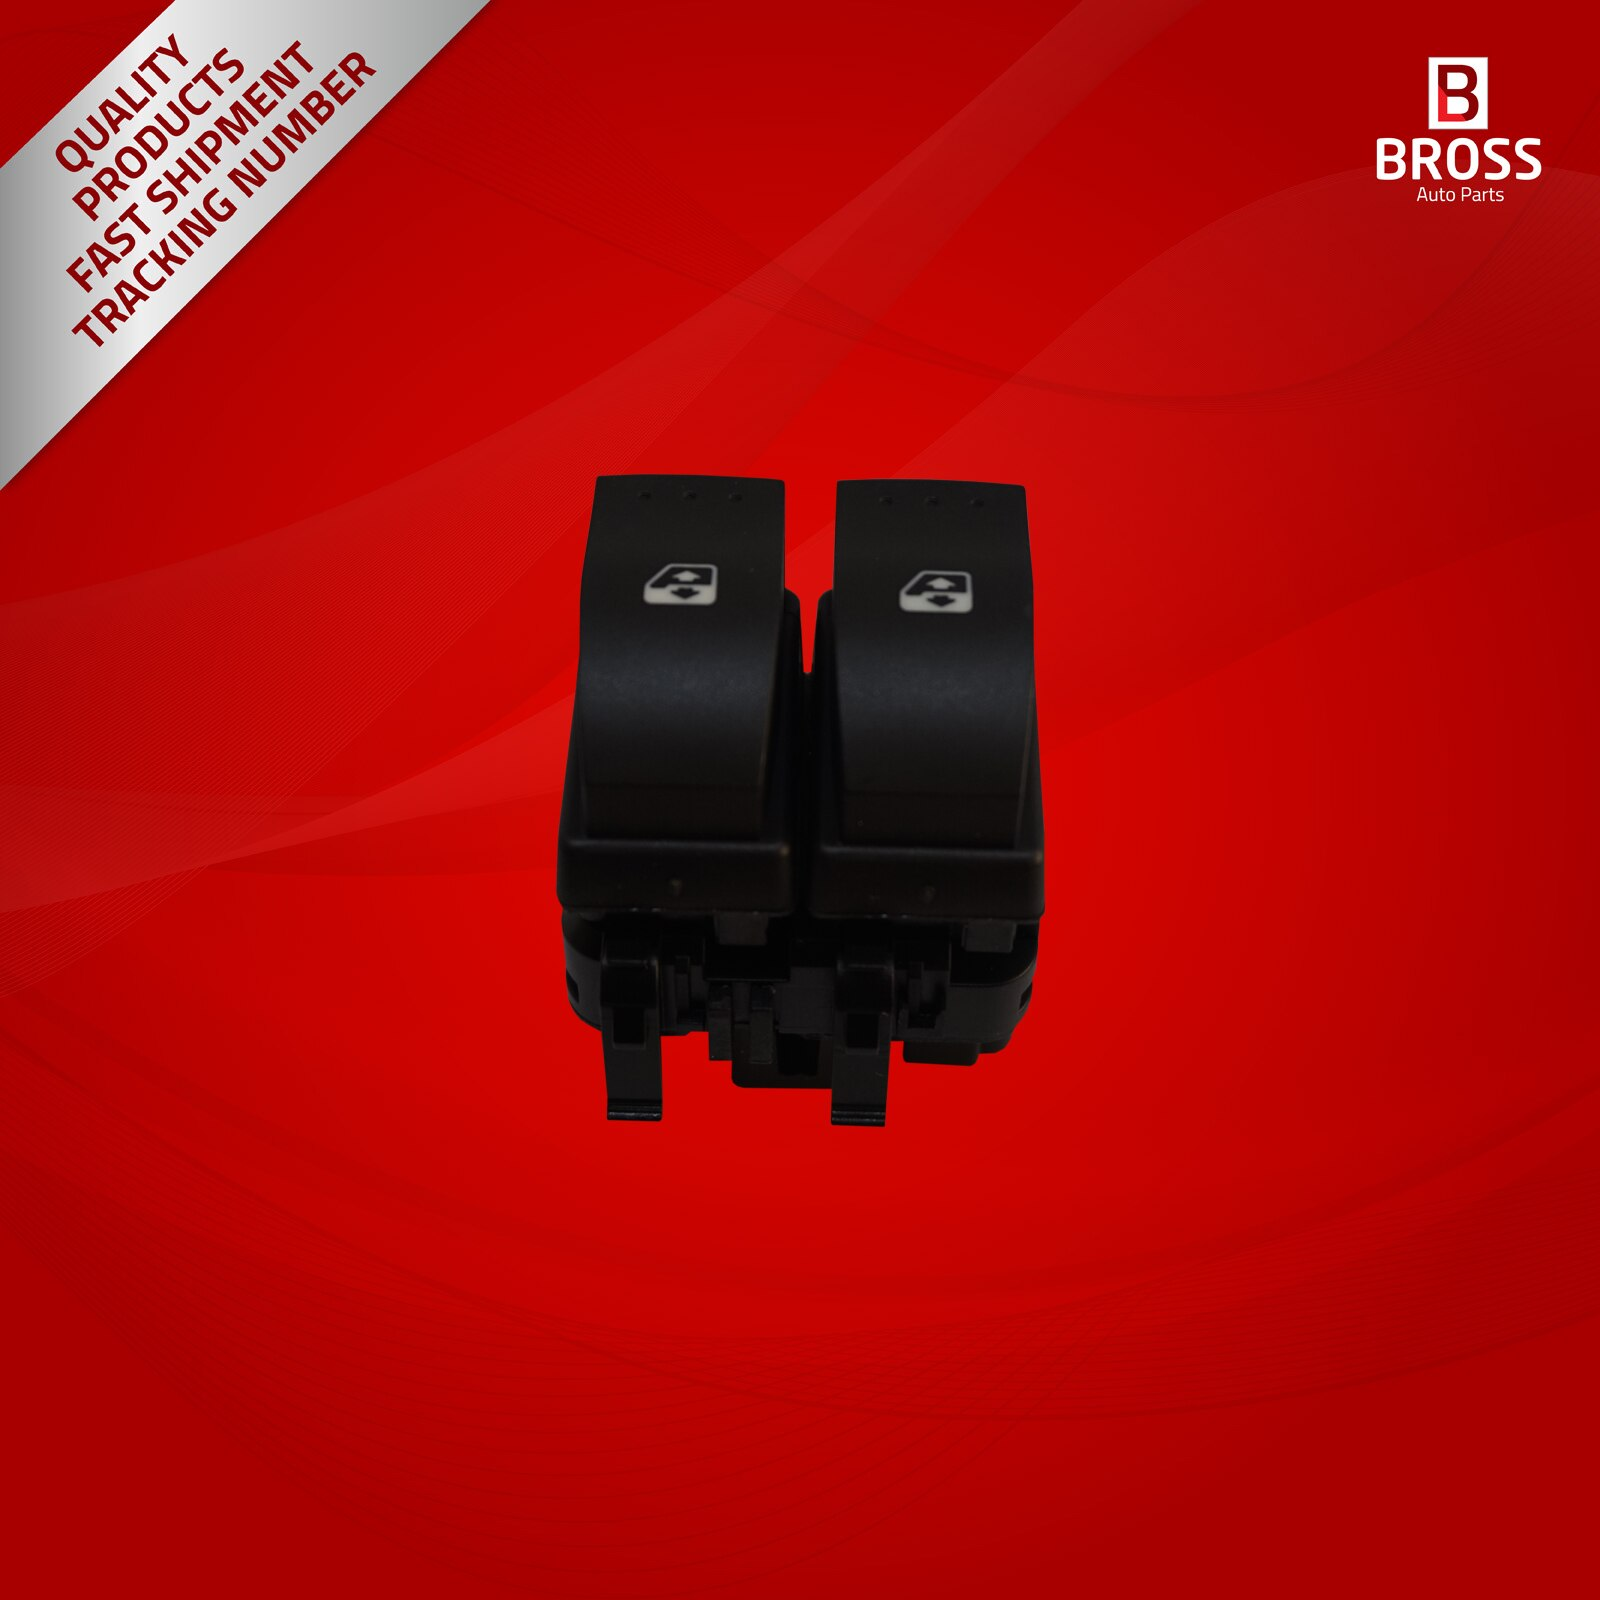 Bross Auto Parts BDP848 Window Control Double Switch 10-Pin 8200060045 BLACK Color for Clio MK2-MK3 1998-2014 Made in Turkey